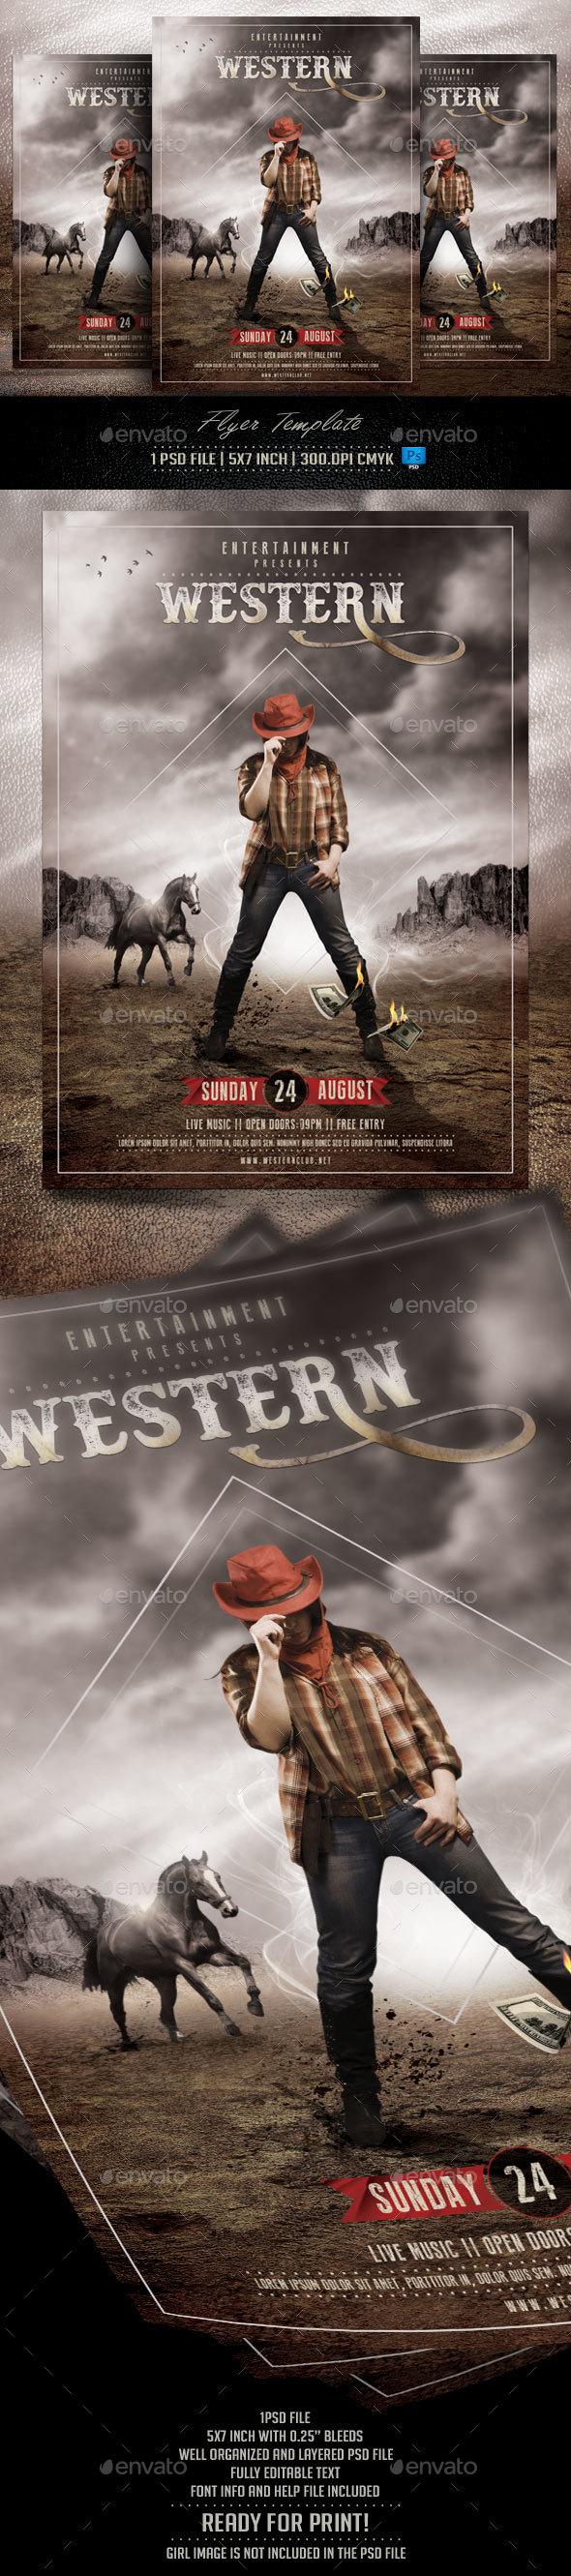 Western Flyer Template - Flyers Print Templates